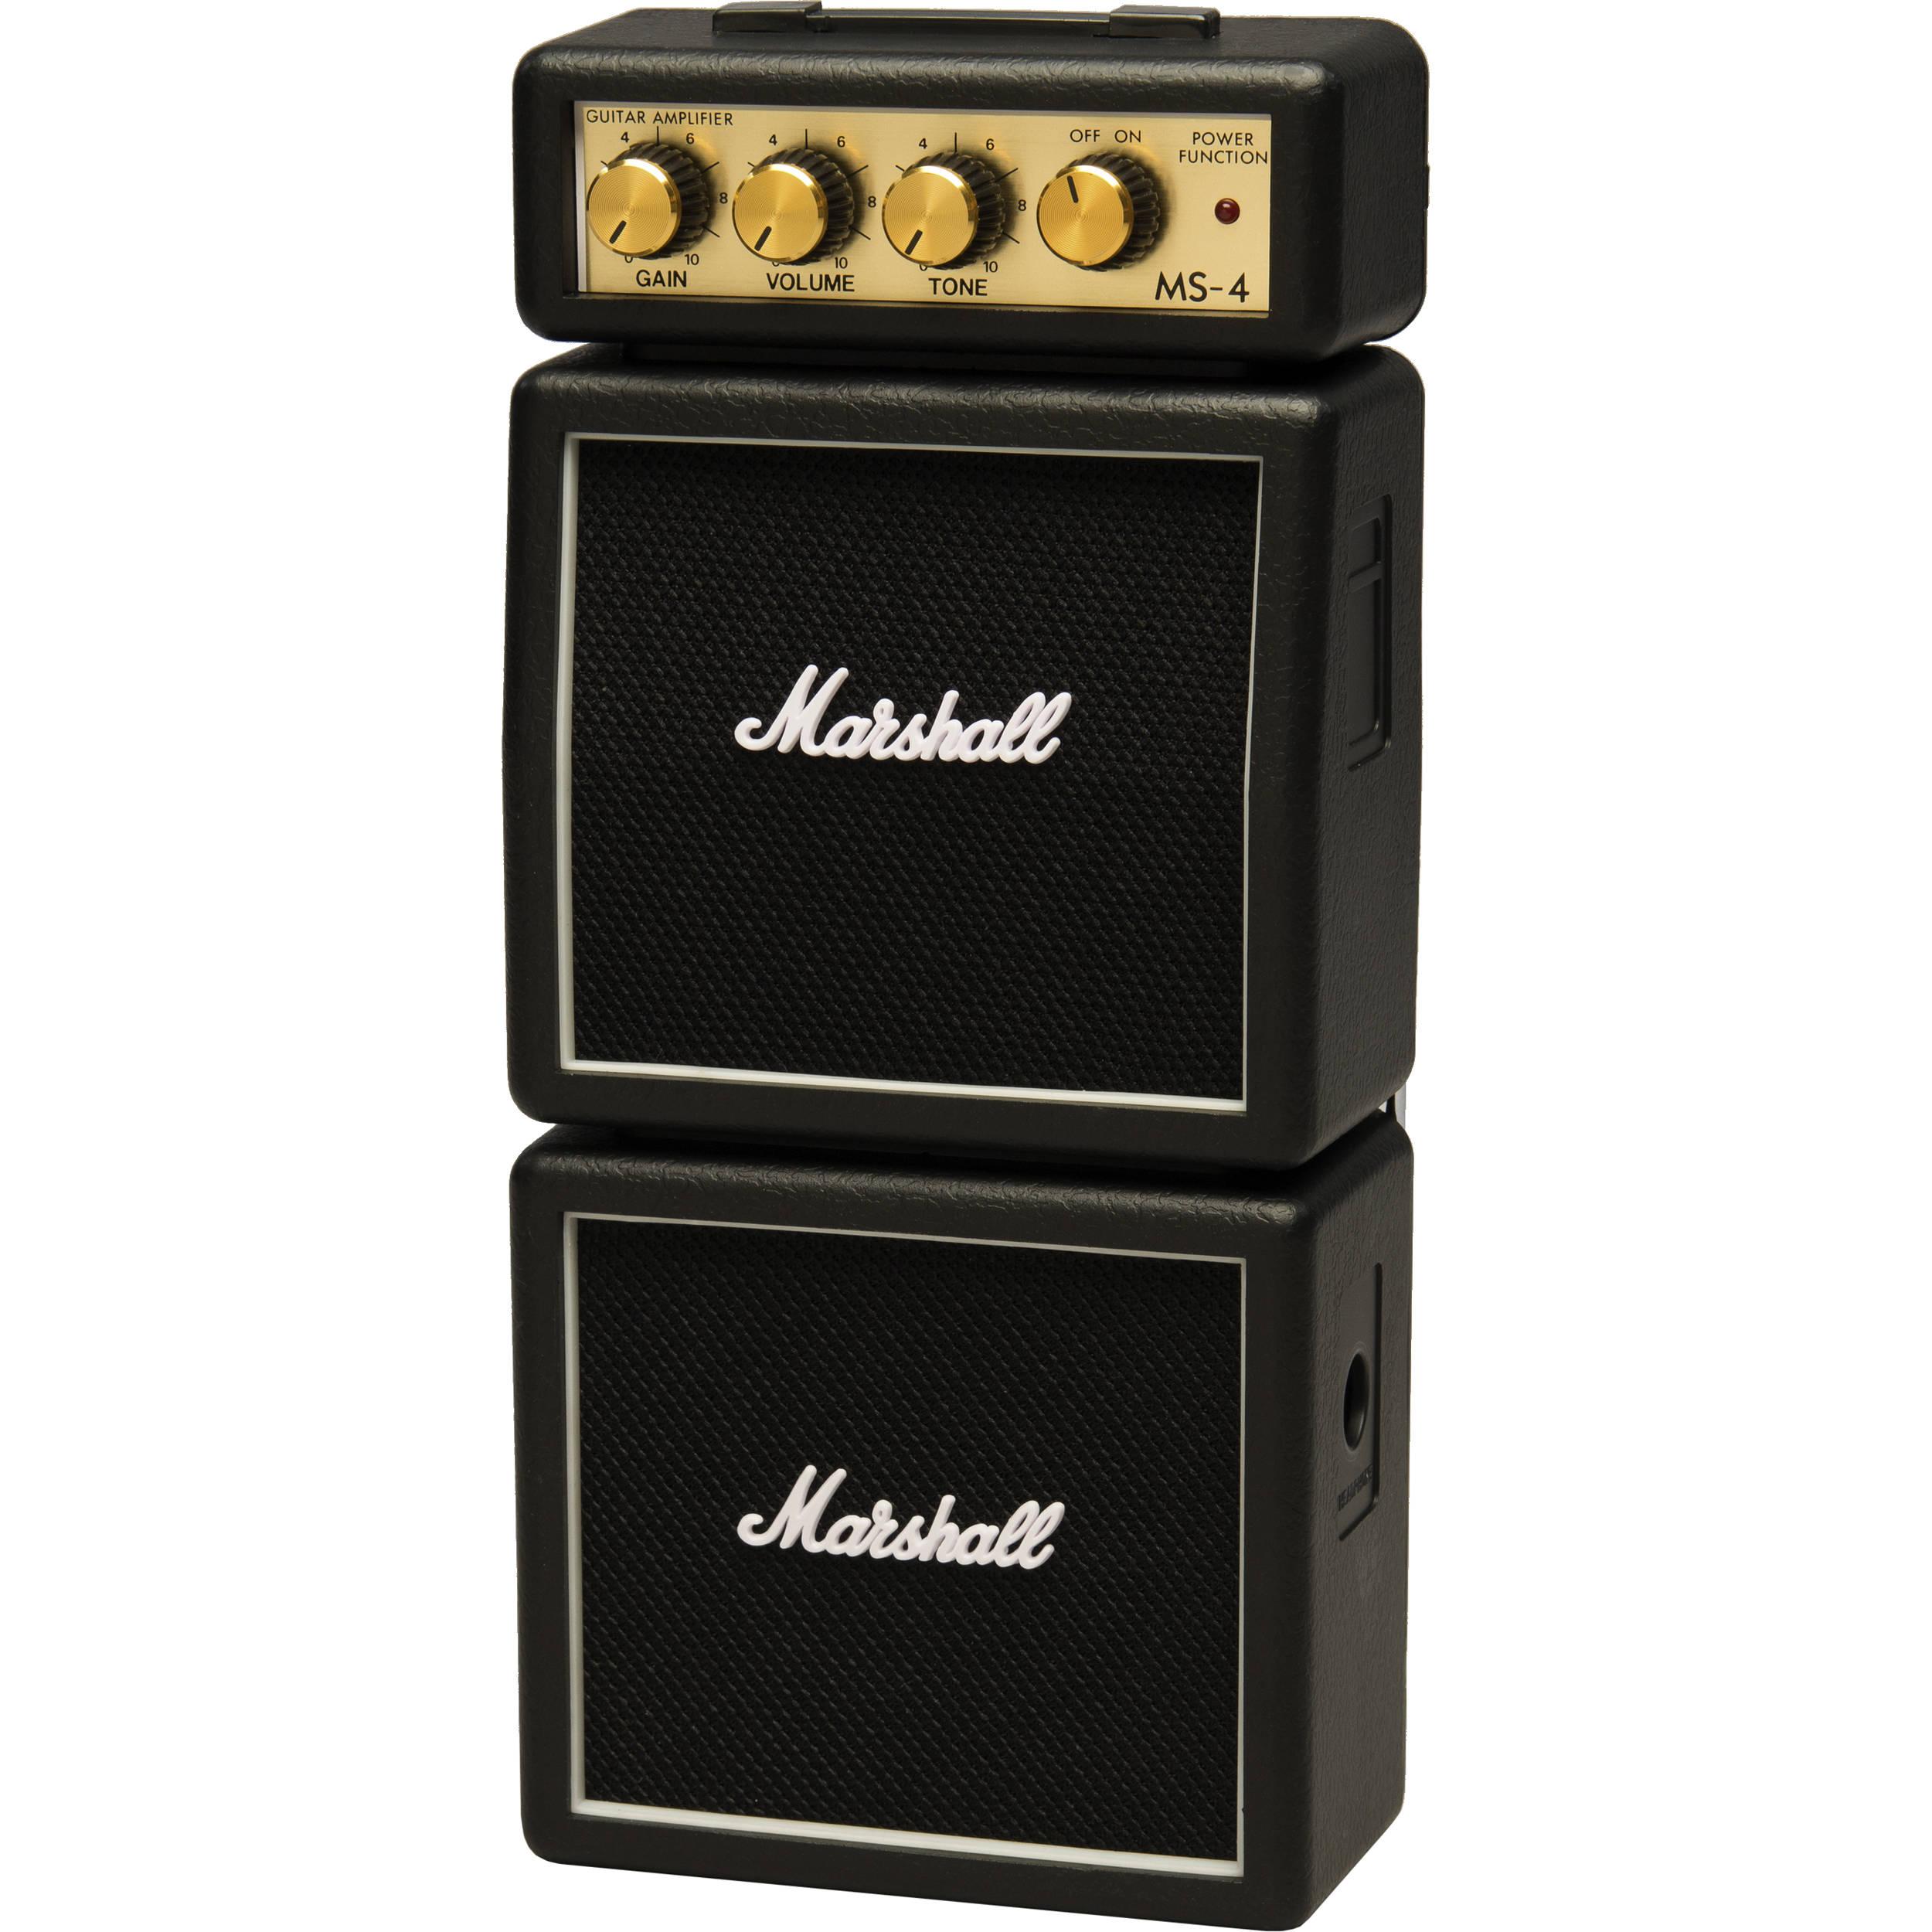 Marshall Mini Amp : marshall amplification ms 4 micro stack mini practice m ms 4 u ~ Russianpoet.info Haus und Dekorationen